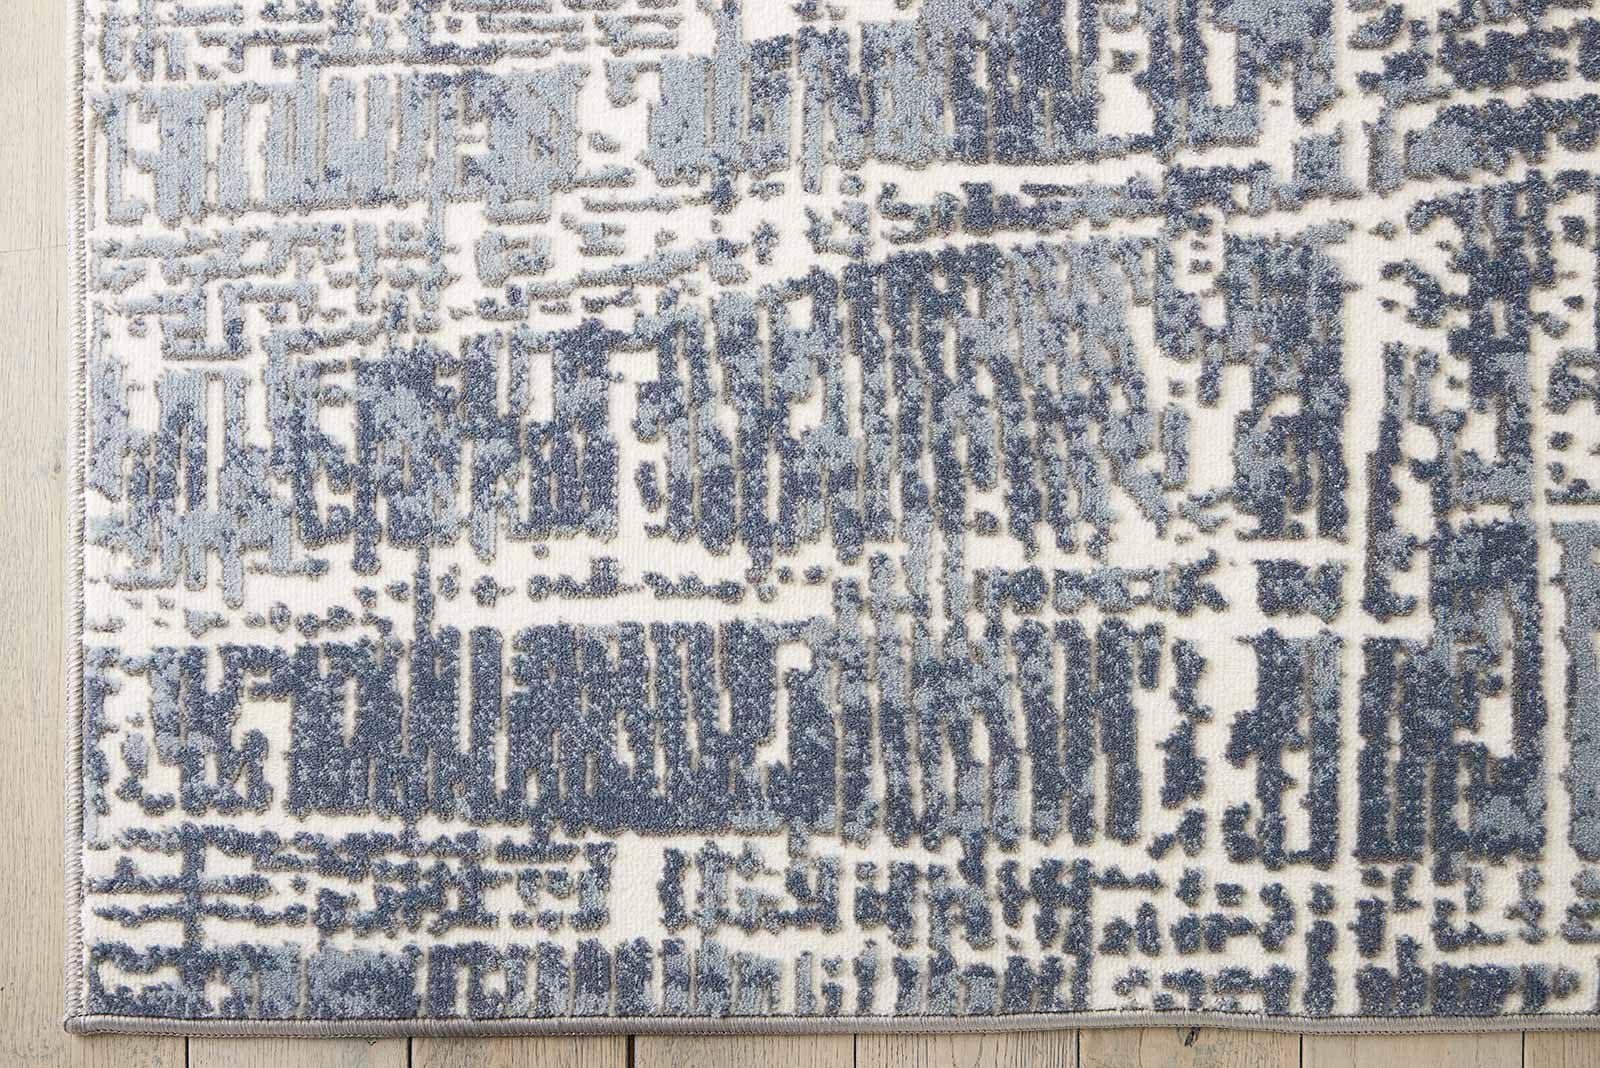 Nourison rug Urban Decor URD01 SLTIV 5x7 099446143563 CR01